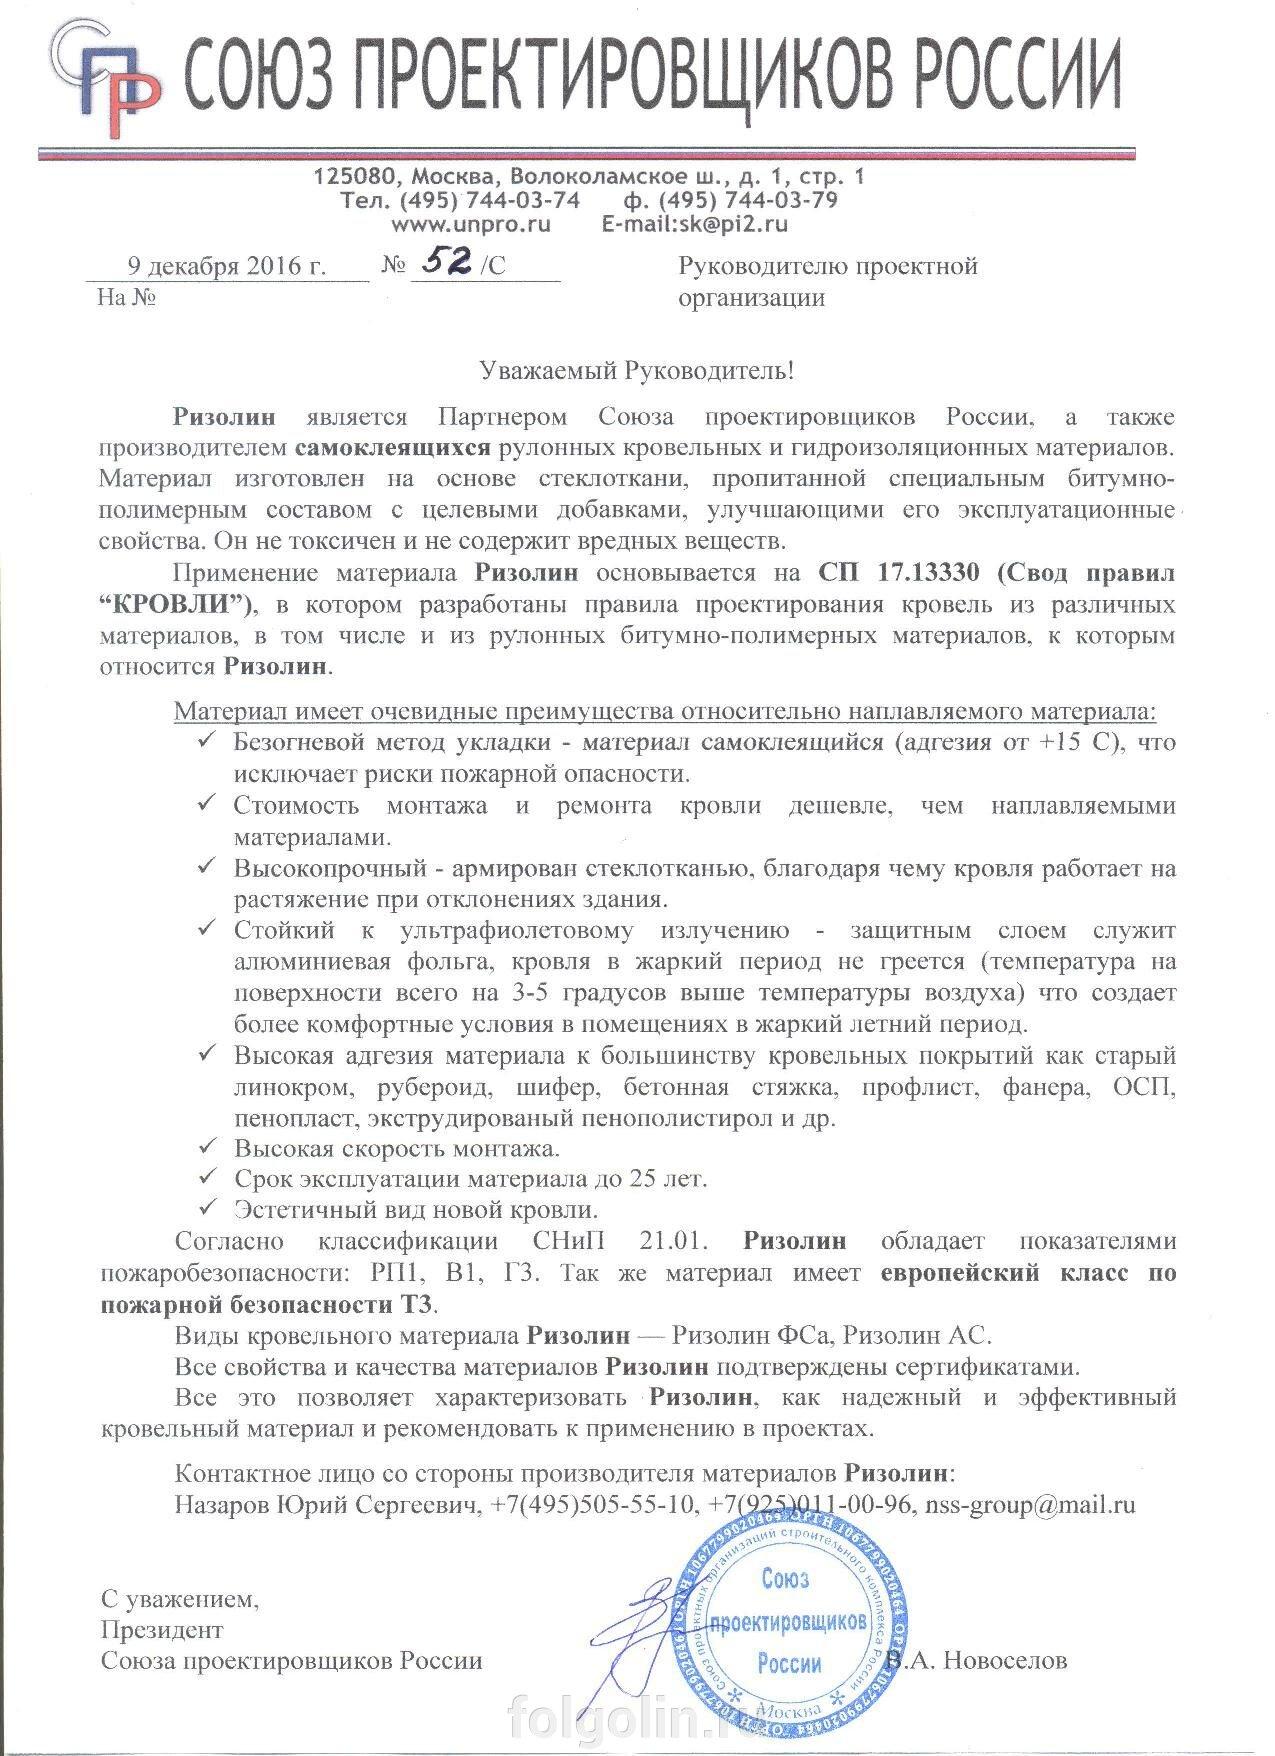 Сертификаты - фото pic_6e11ad8d9b8b795_1920x9000_1.jpg